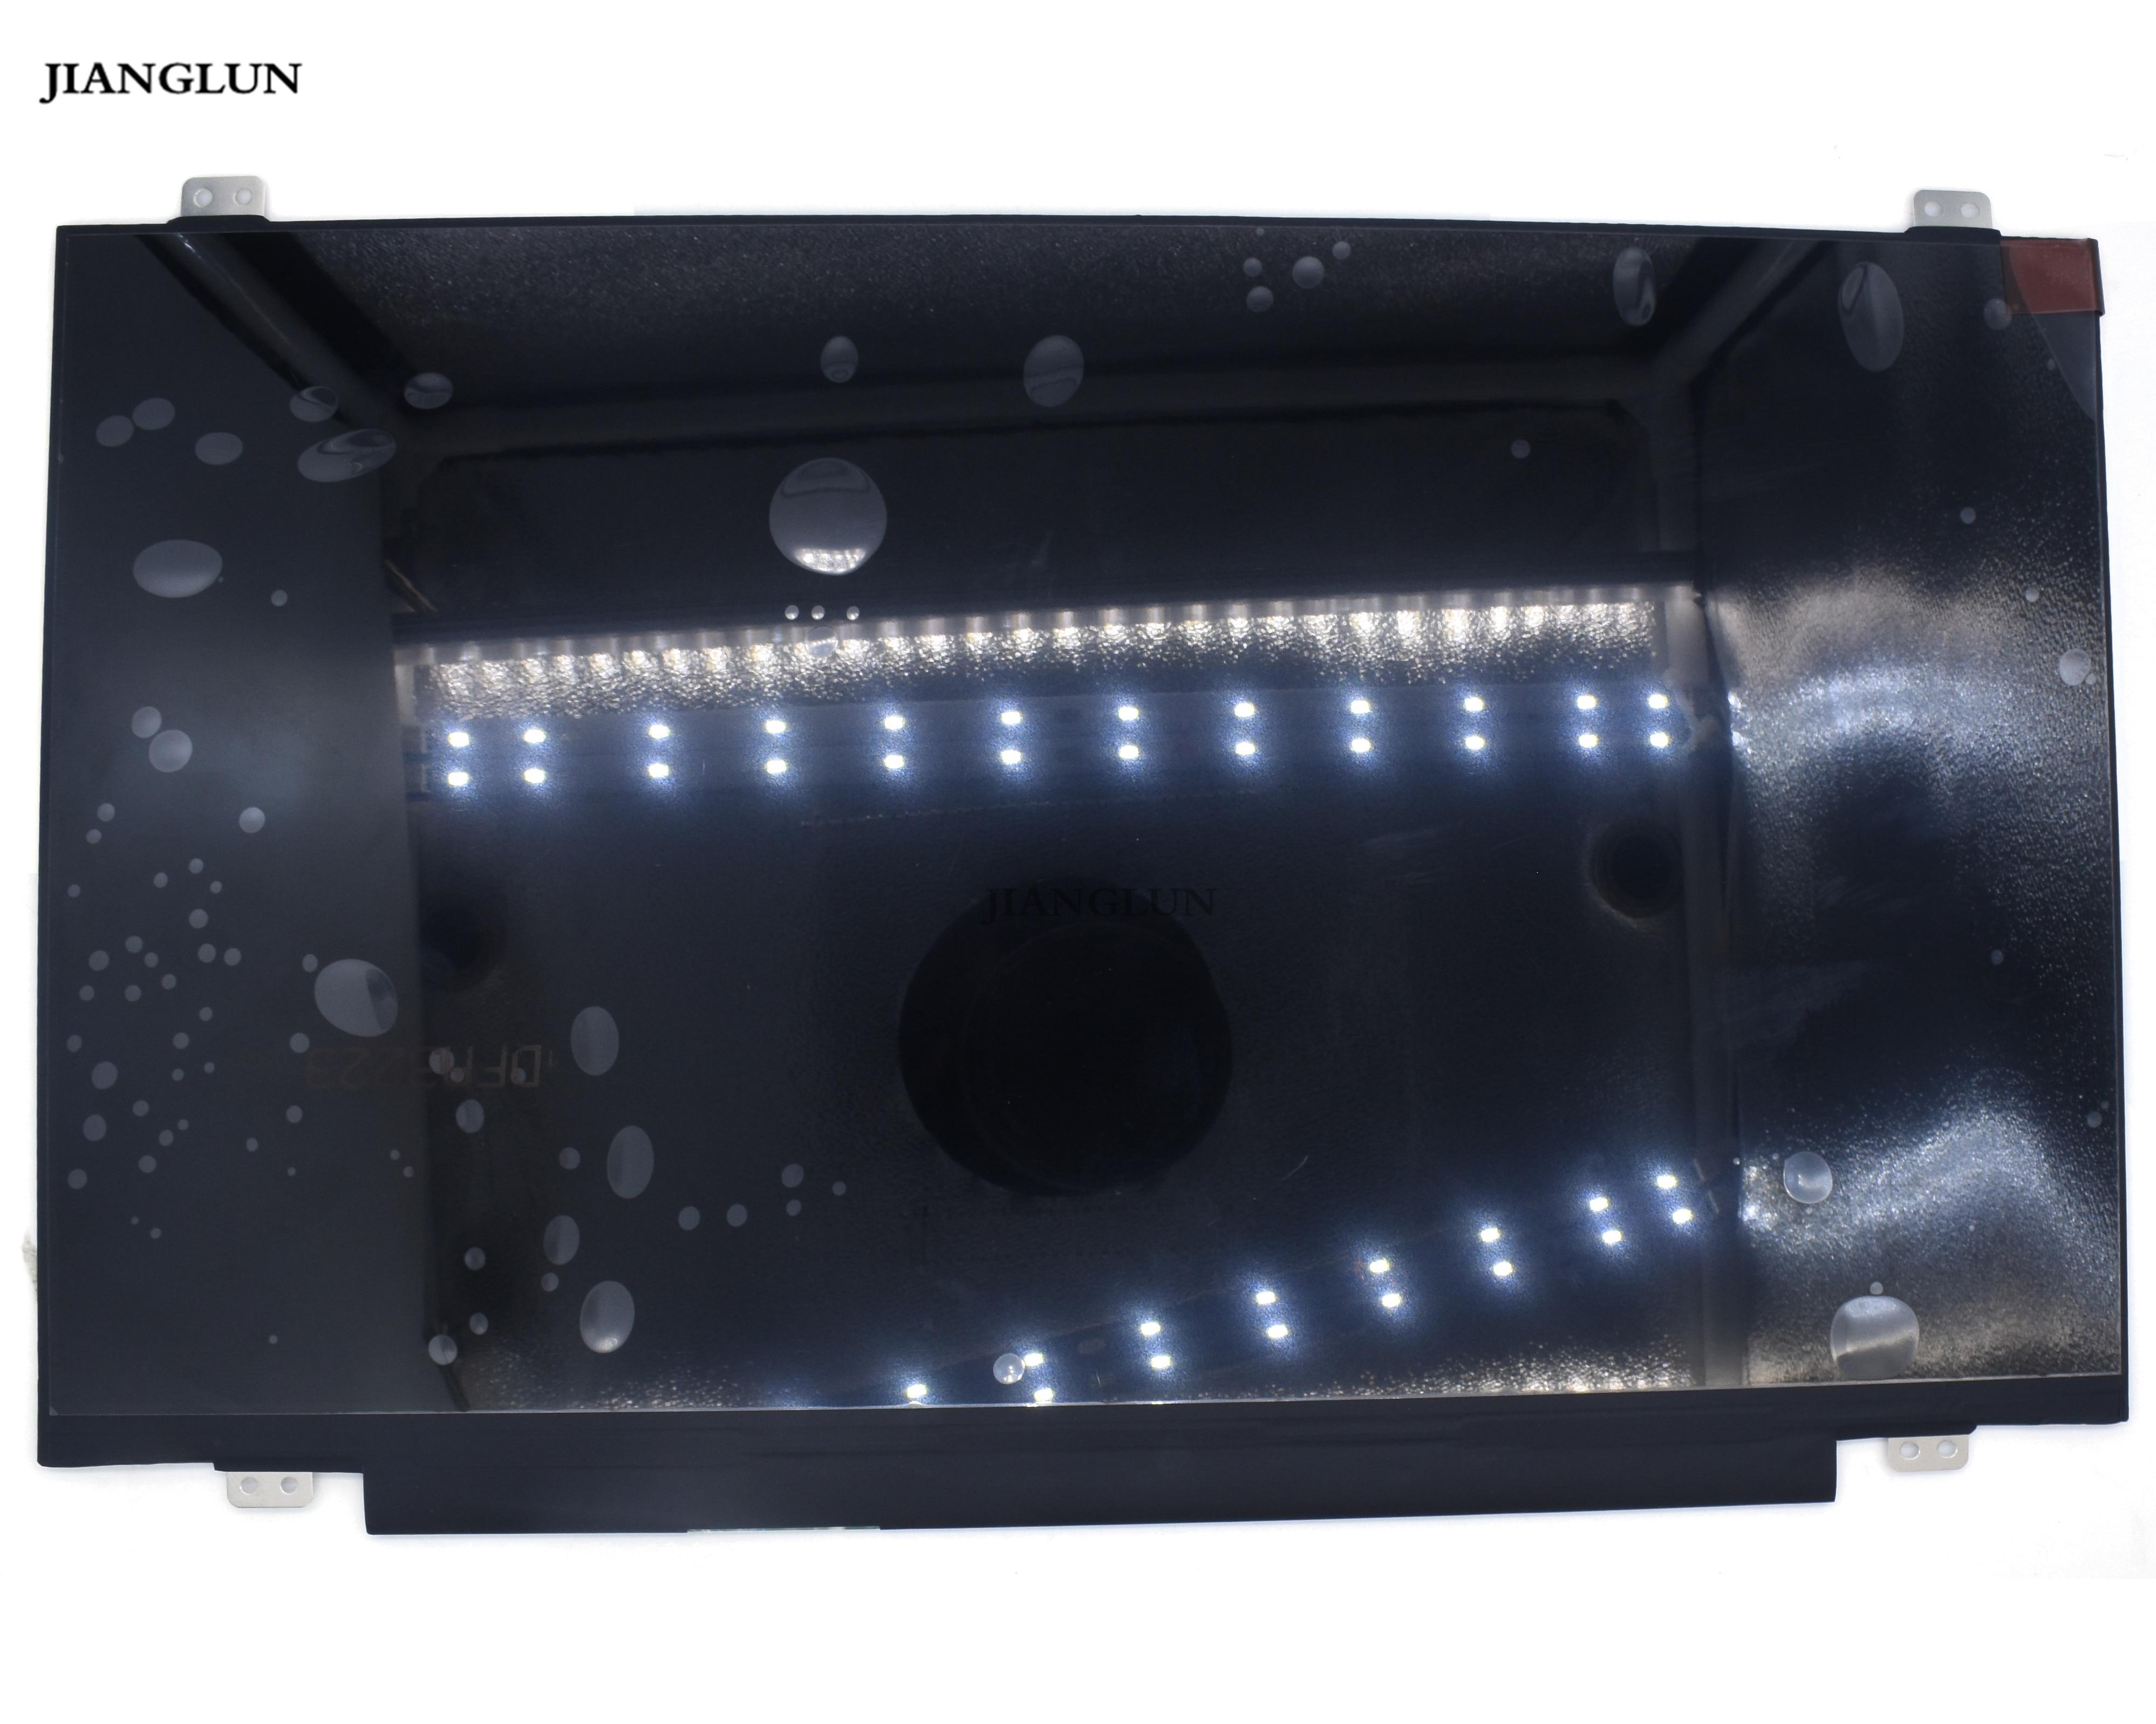 JIANGLUN TV140FHM-NH0 LED لوحة ل ماجيك كتاب lape KPL-W00